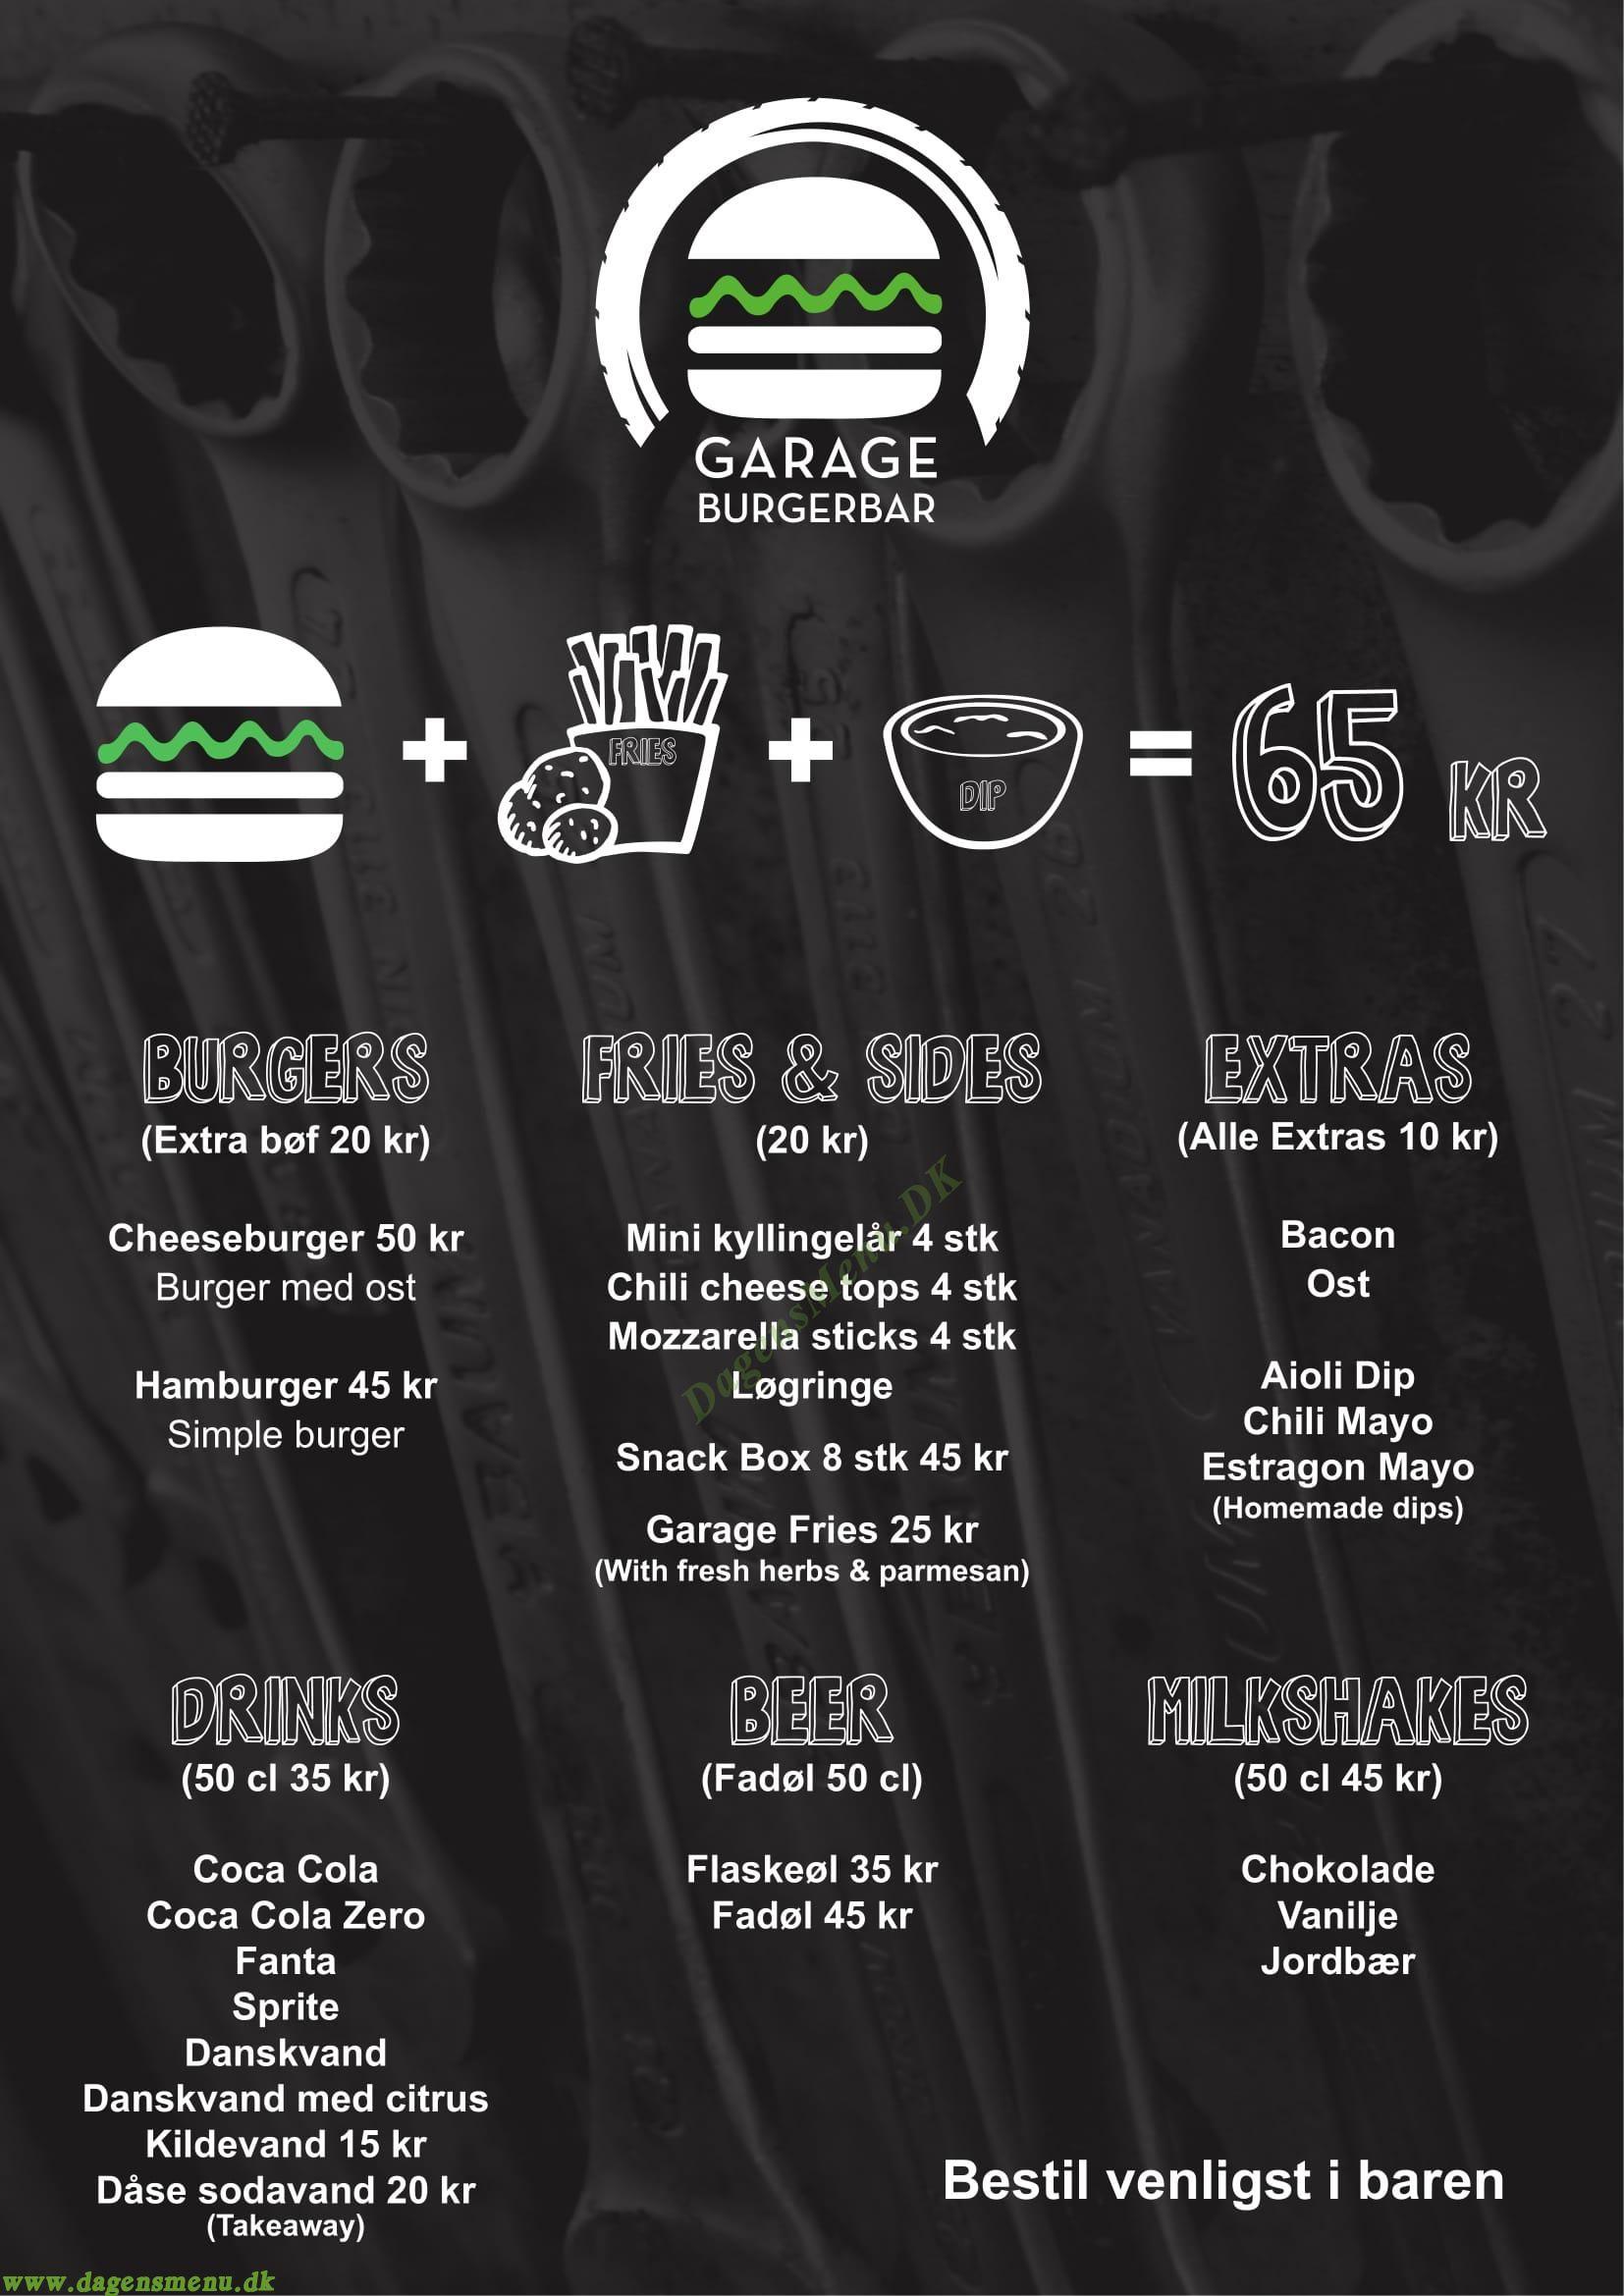 Garage Burgerbar - Menukort